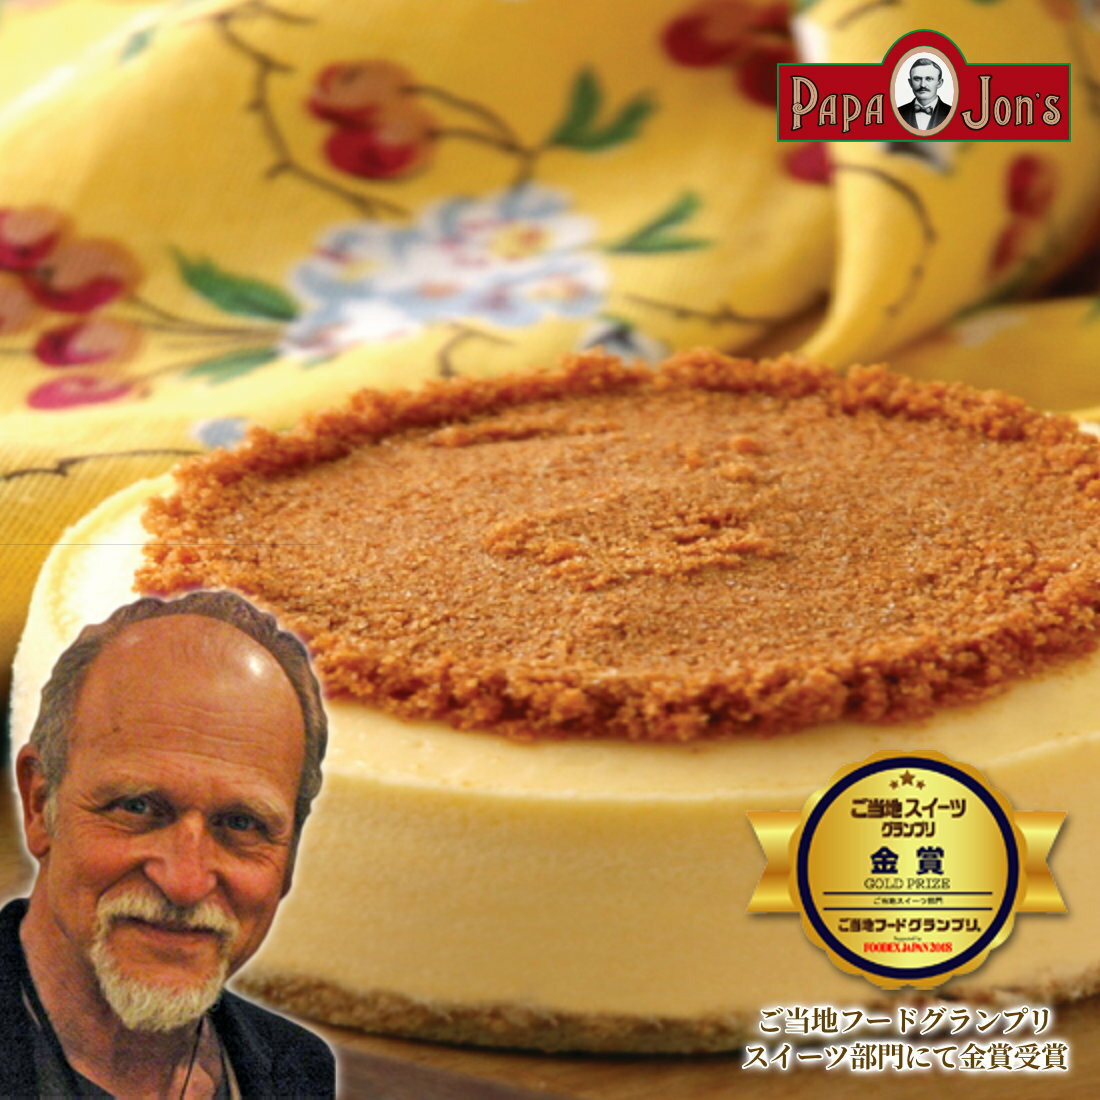 Papa Jon's(パパジョンズ) 『ニューヨークチーズケーキ』